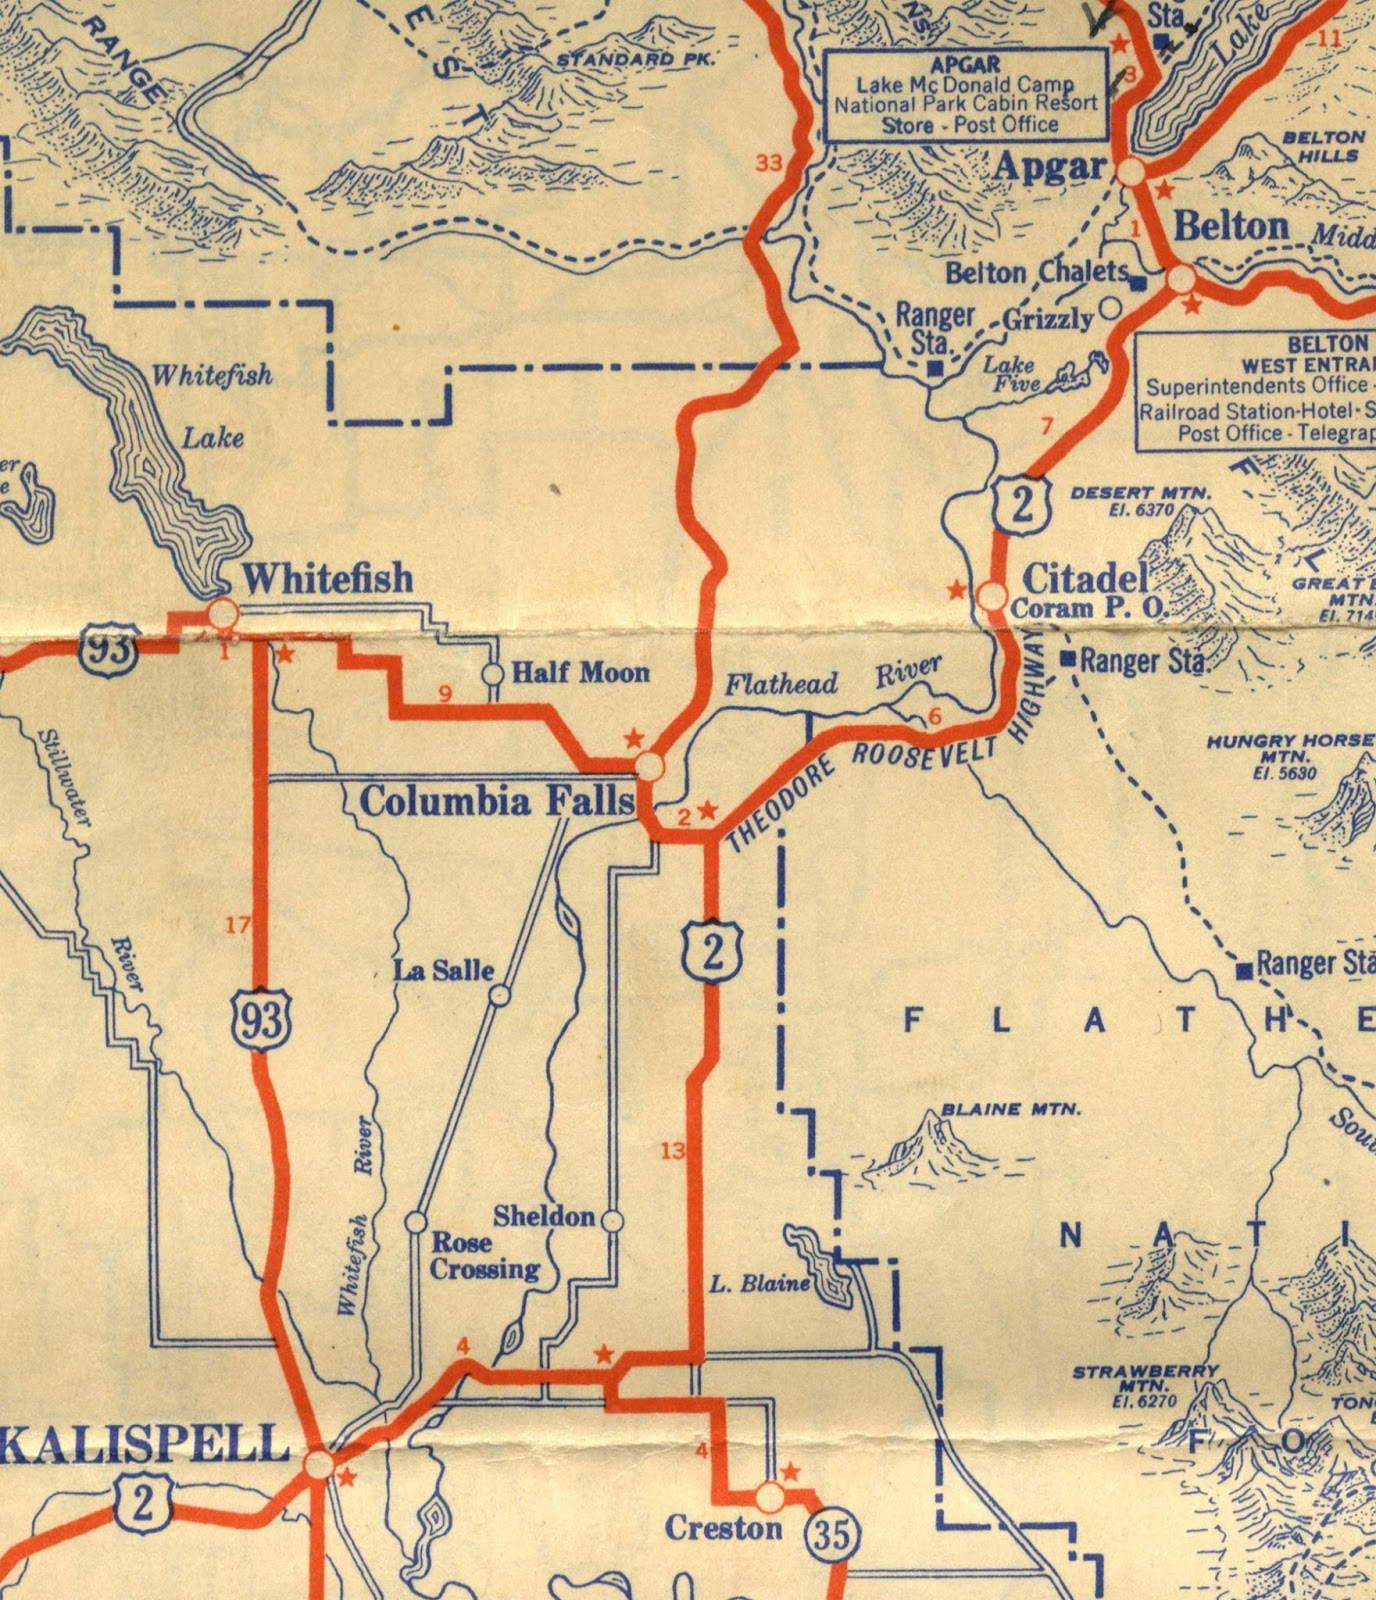 robert s 1936 glacier national park map